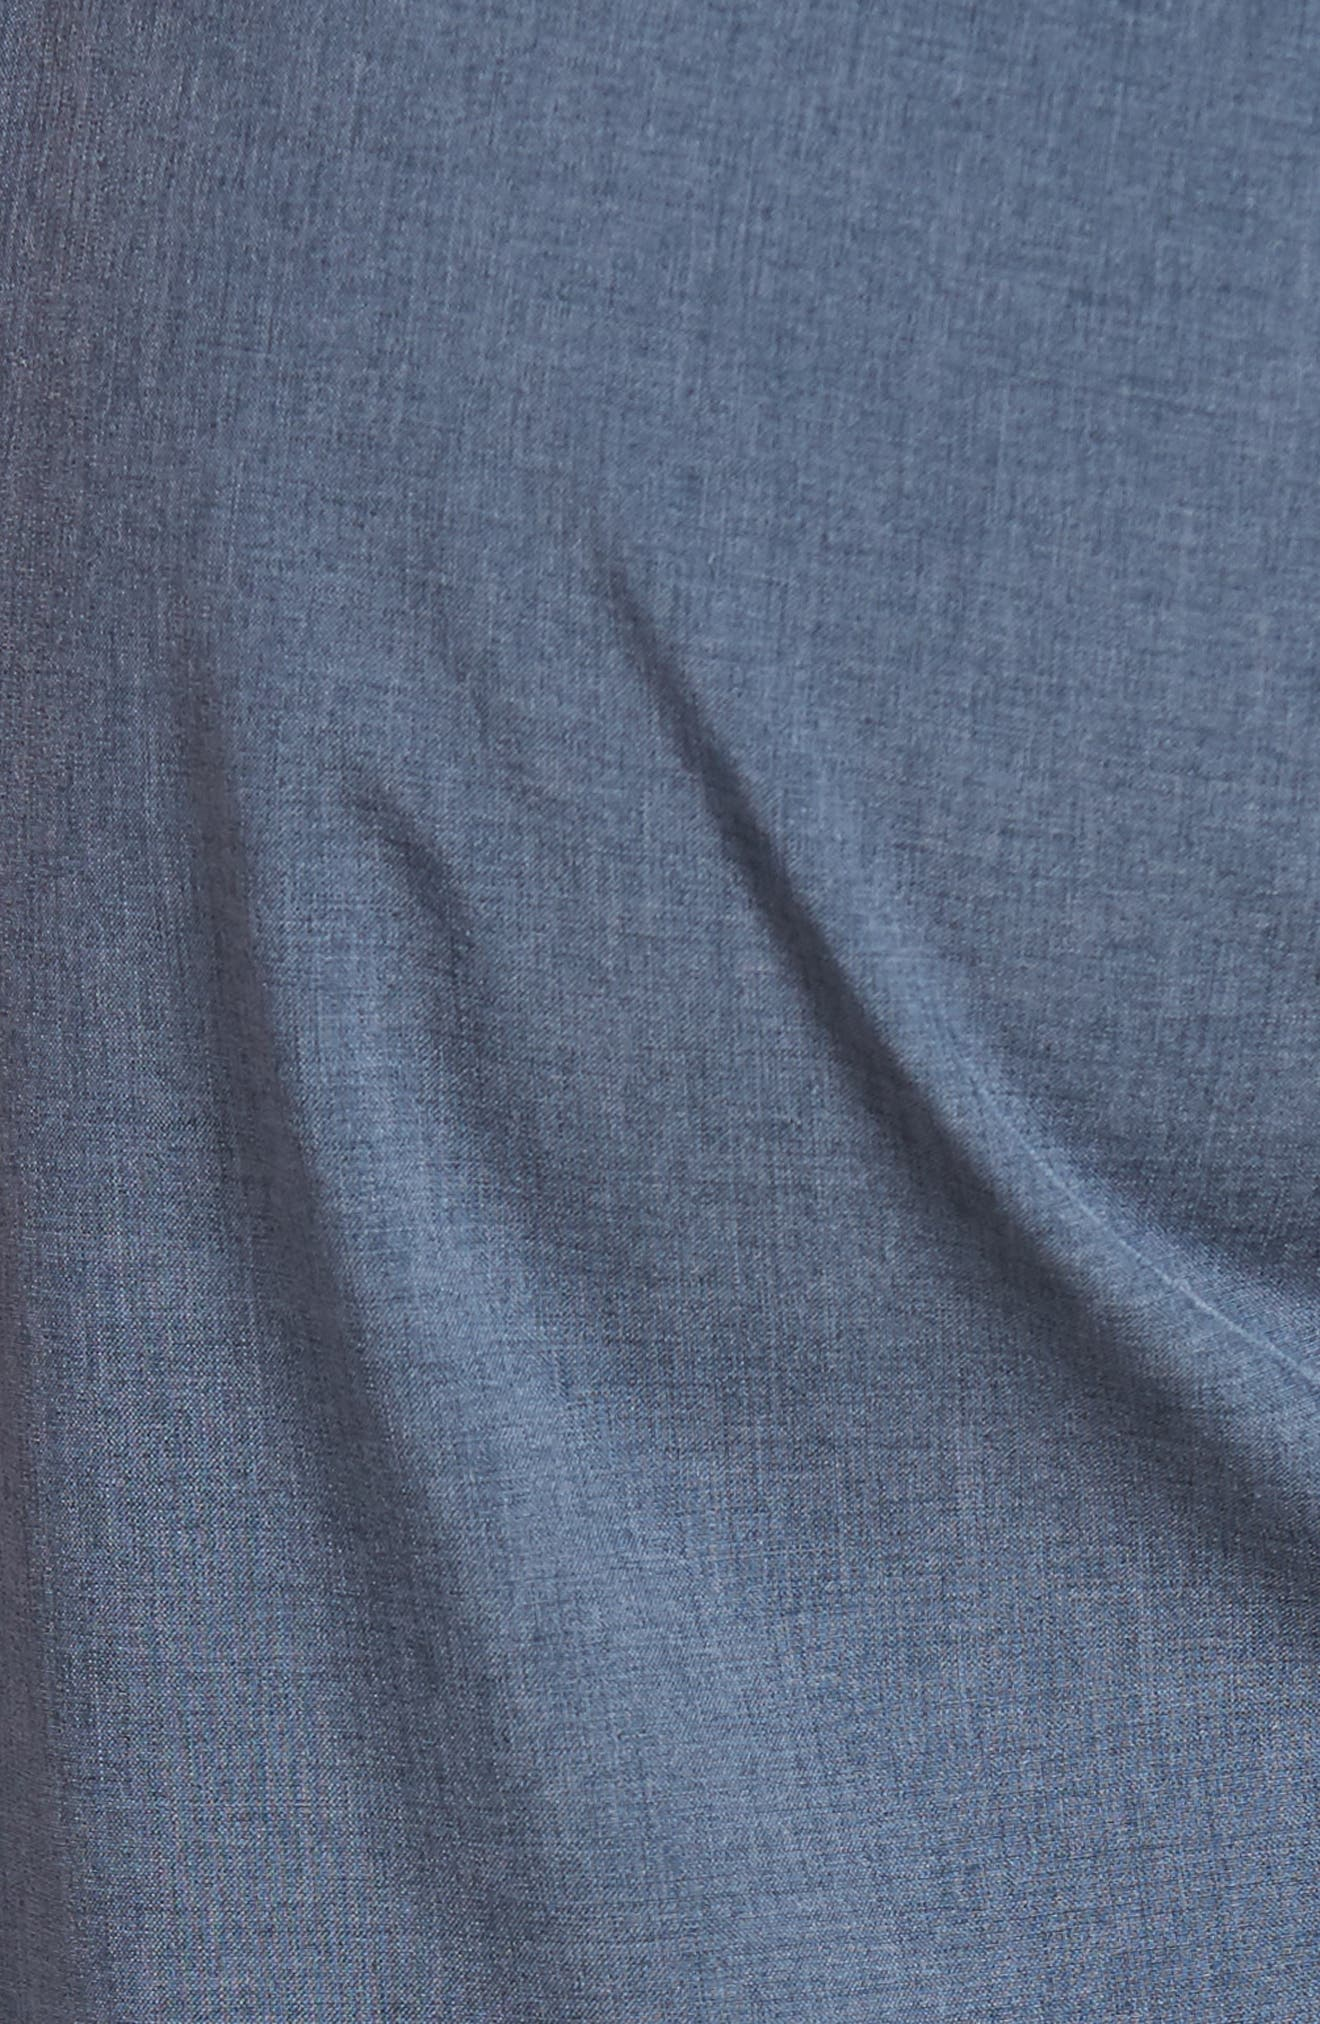 Banks Performance Hybrid Shorts,                             Alternate thumbnail 5, color,                             AZURE LINEN TEXTURE